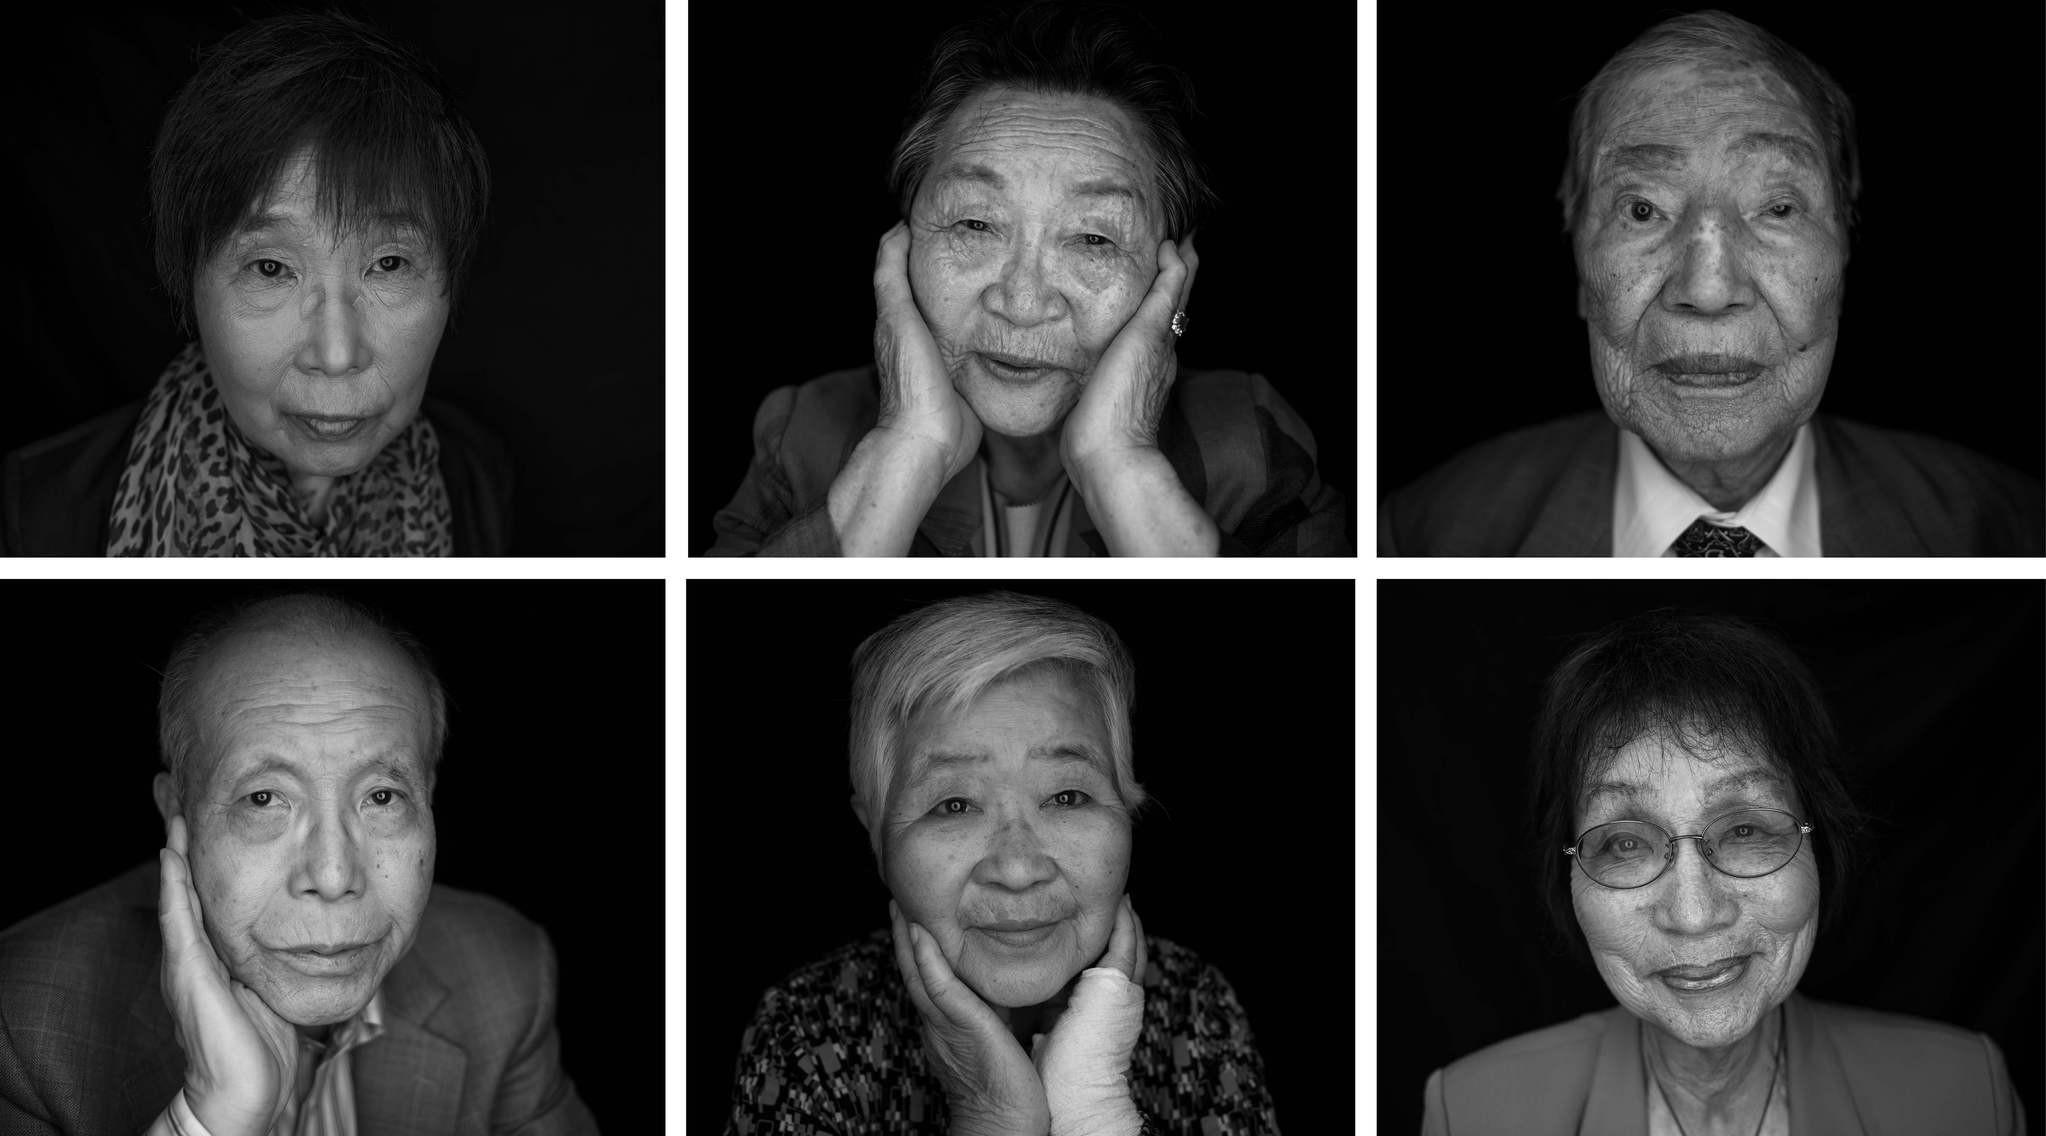 Survivors of the 1945 atomic bombing of Hiroshima, (top L to R) Keiko Ogura, Park Nam-Joo, Sunao Tsuboi, and (bottom row L to R) Shigeaki Mori, Misako Katani and Emiko Okada in Hiroshima. (AFP Photo)